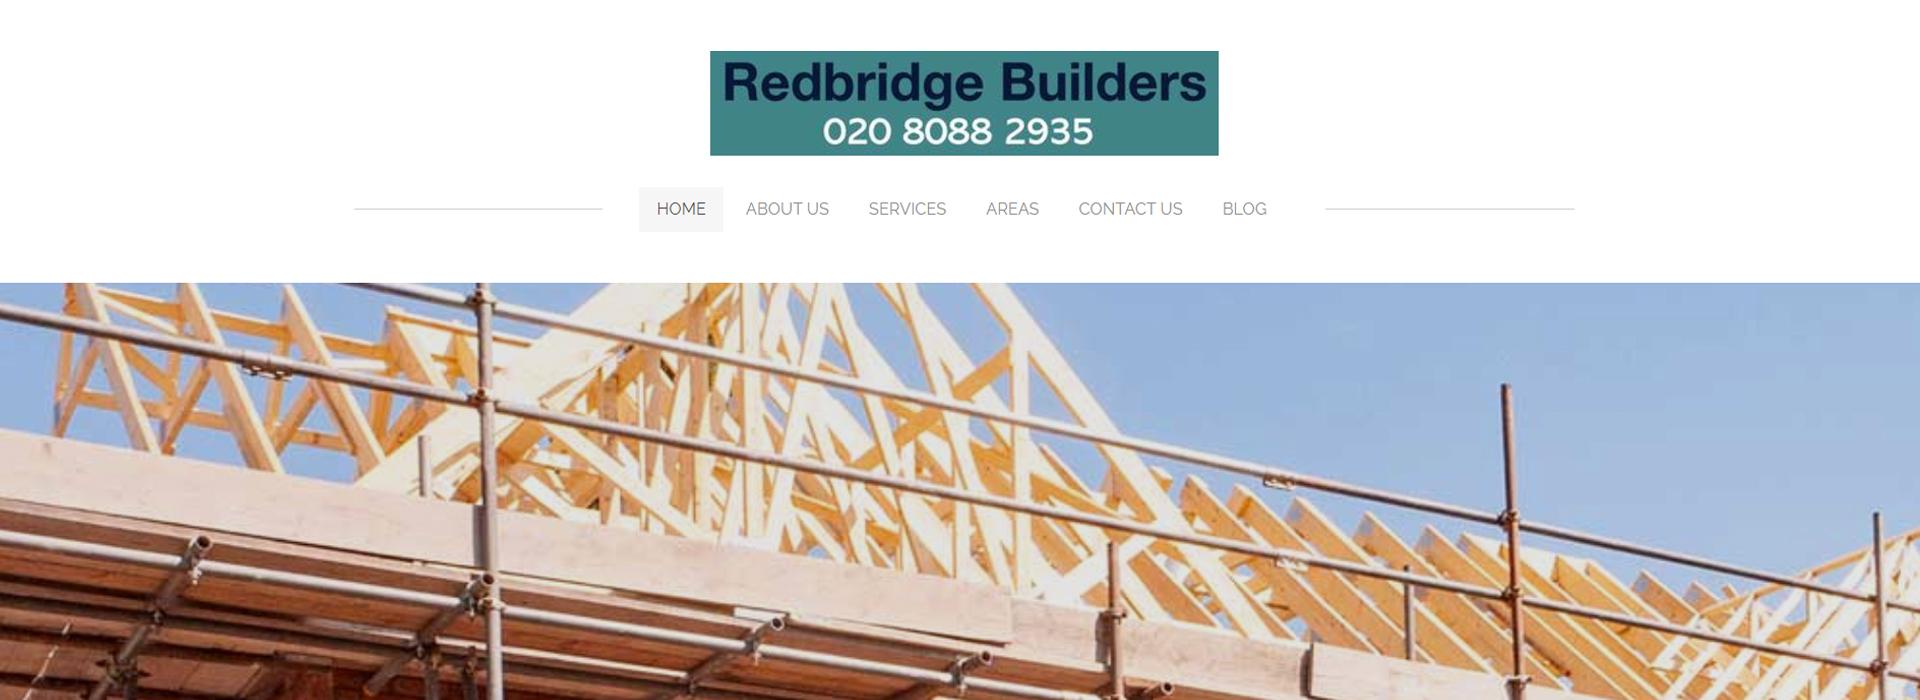 redbridge builders